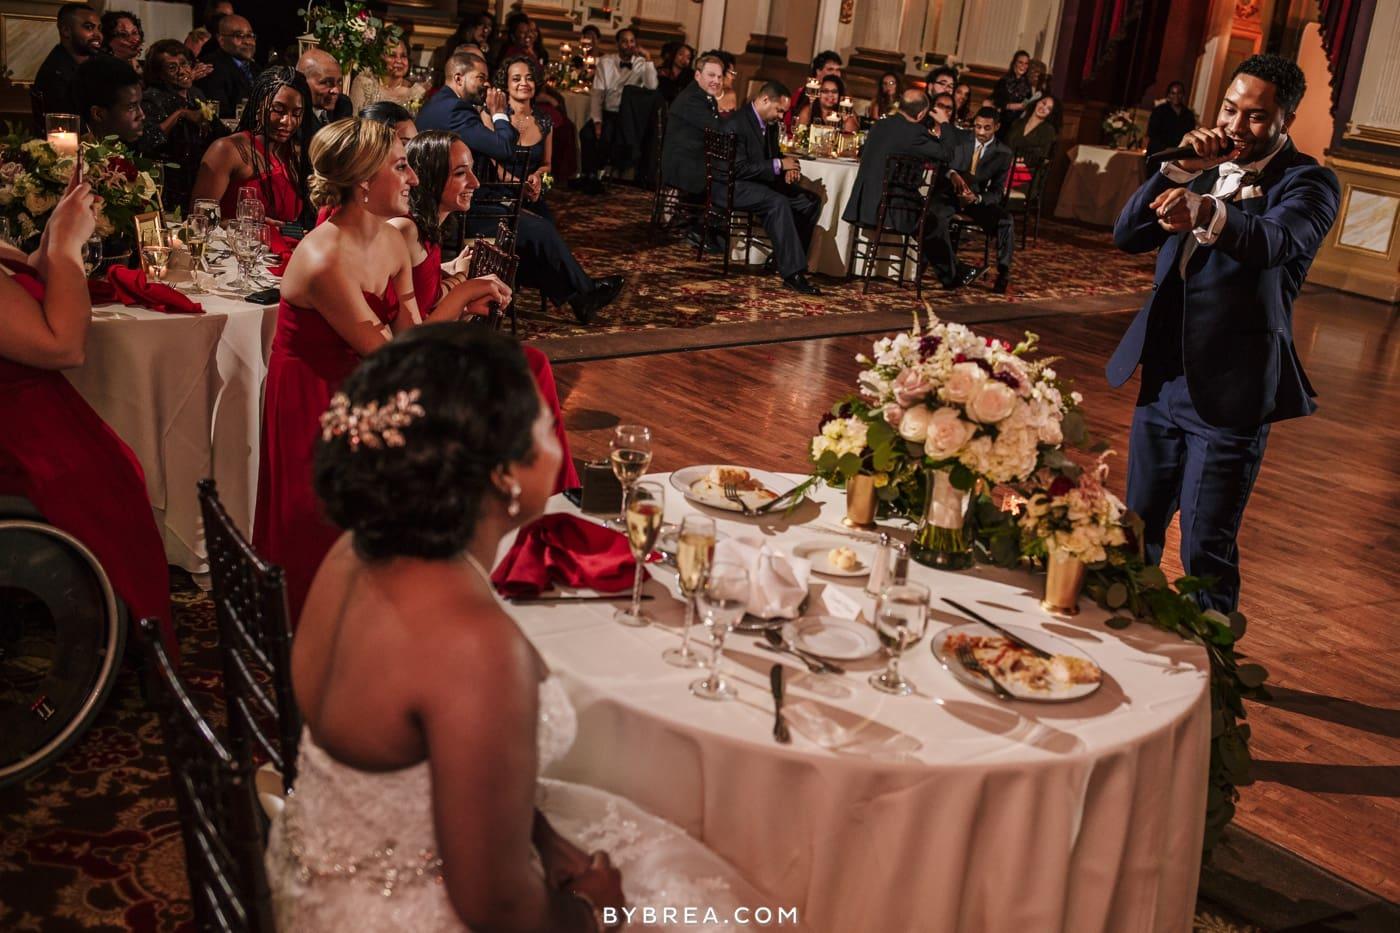 dani-bryce-winter-belvedere-baltimore-wedding-photos_0073